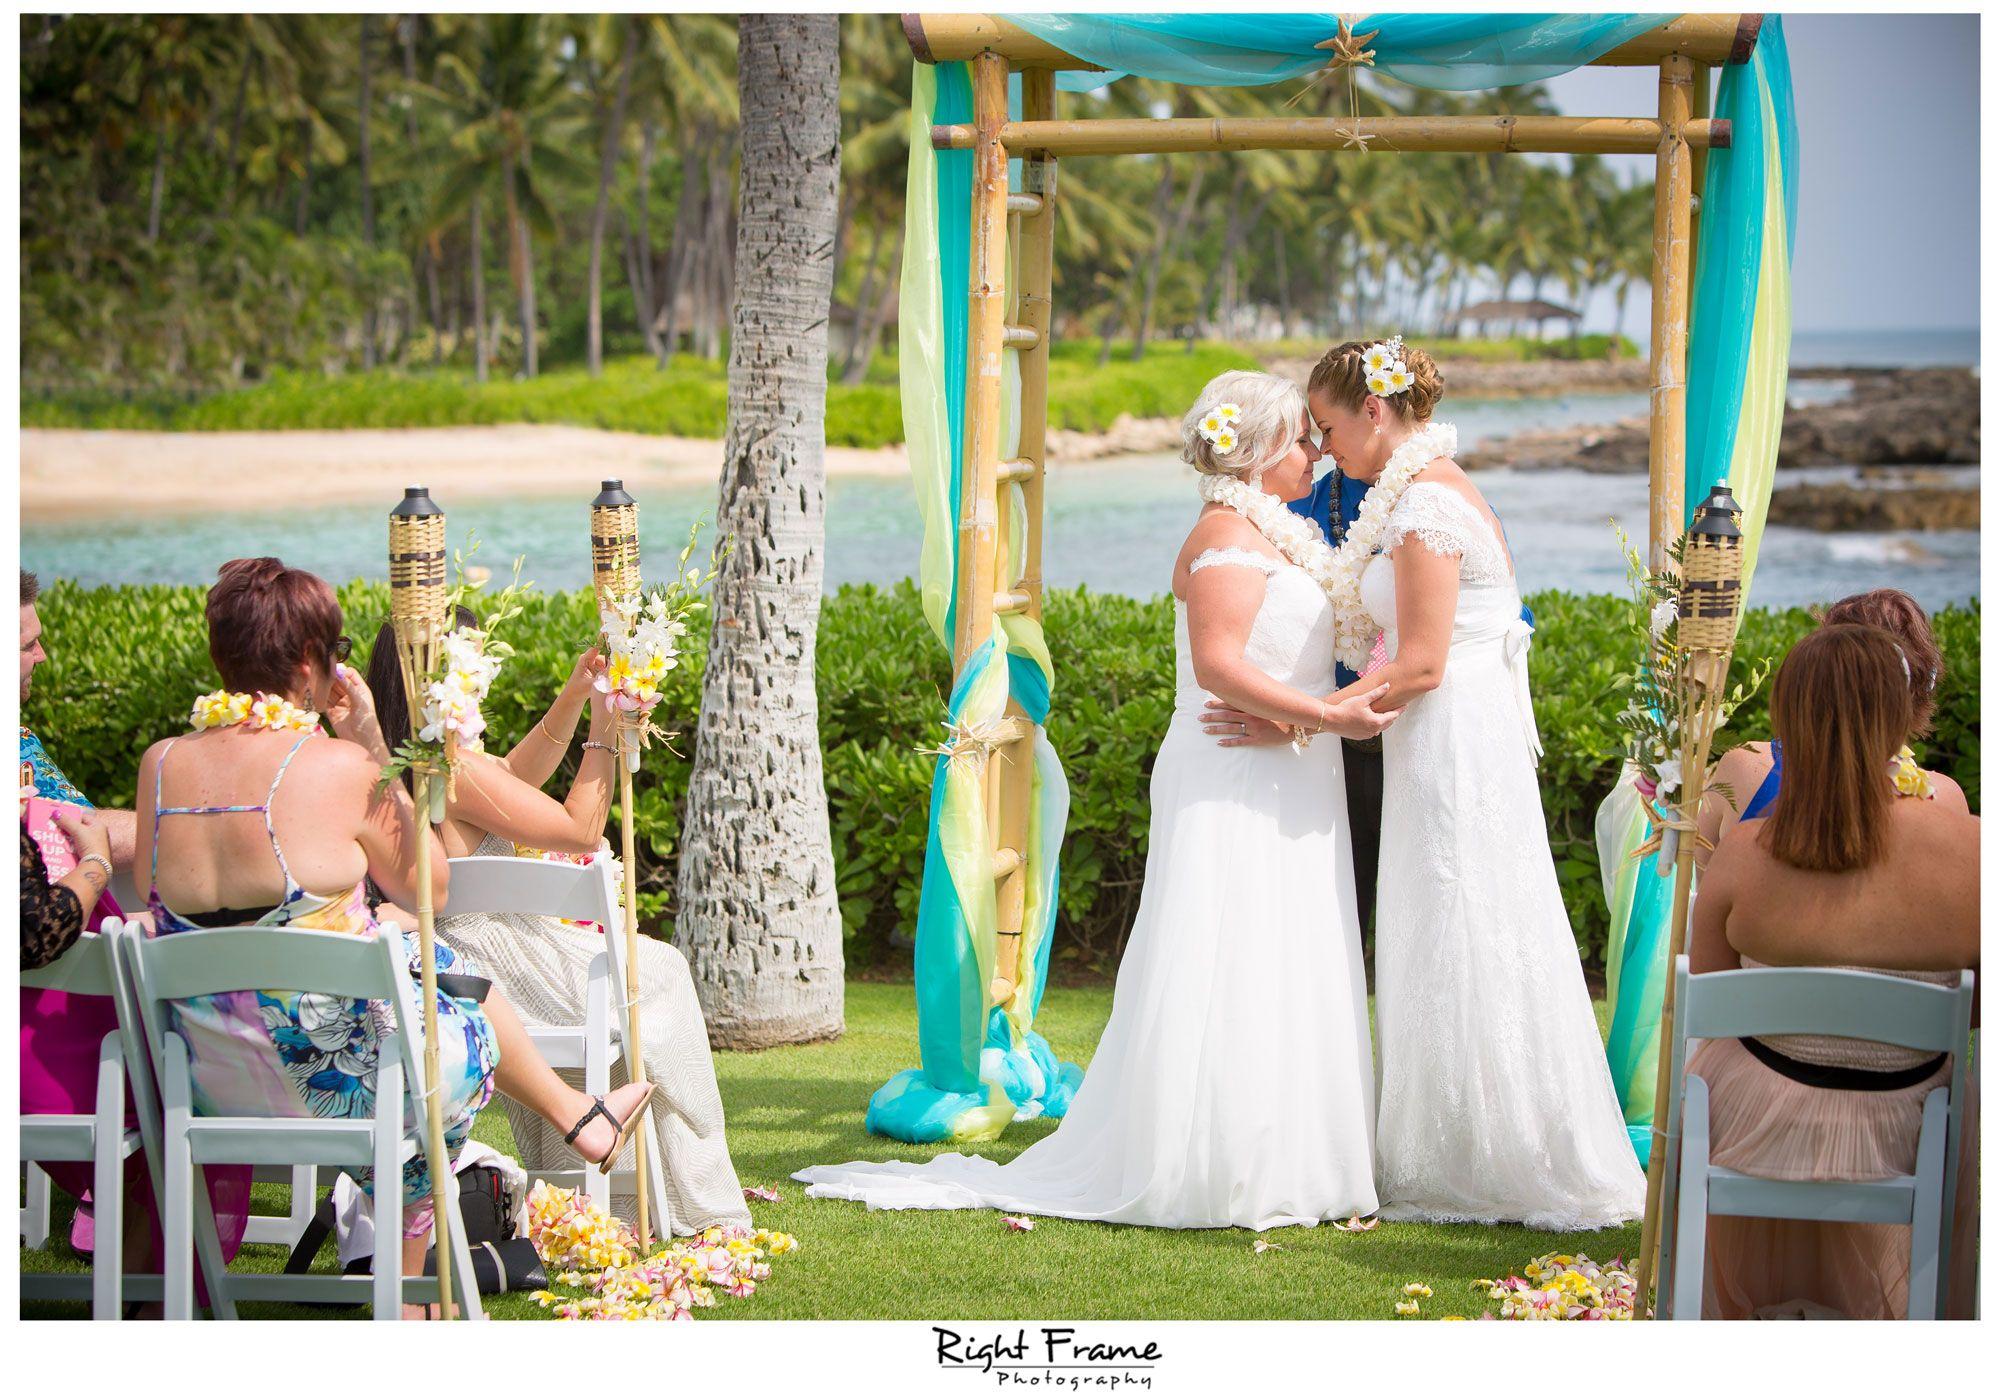 Rightframe Paradise Cove Disney Aulani Resort Hawaii Wedding Photographer